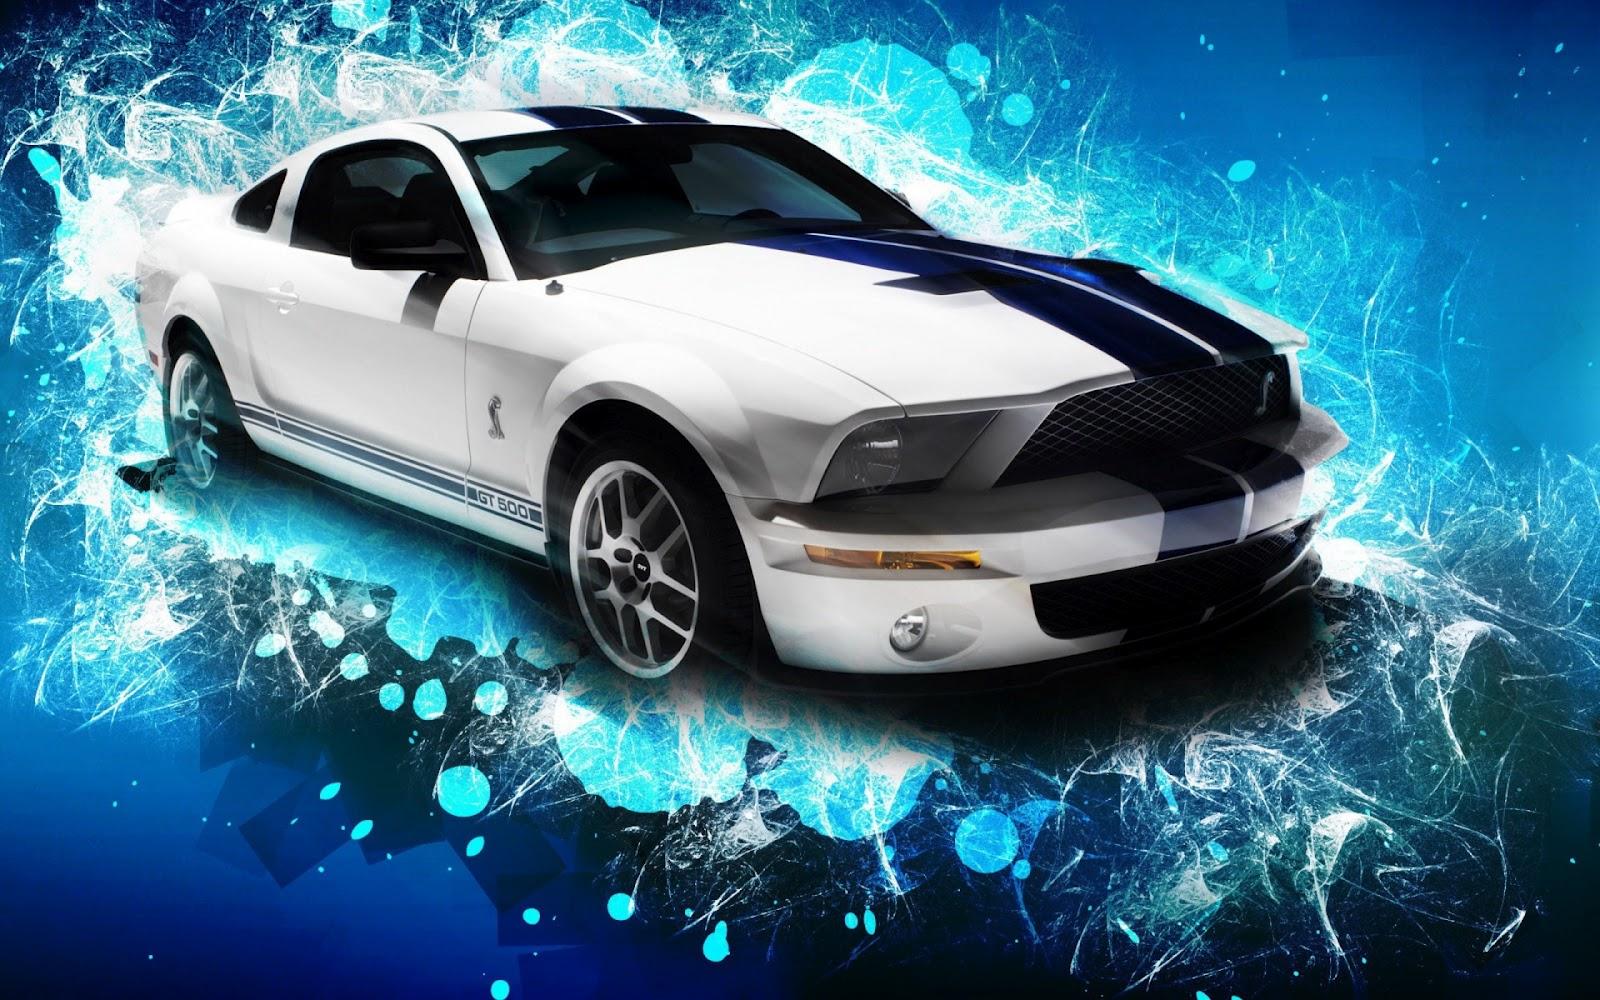 HD Desktop Wallpapers Free Online: Car Wallpapers